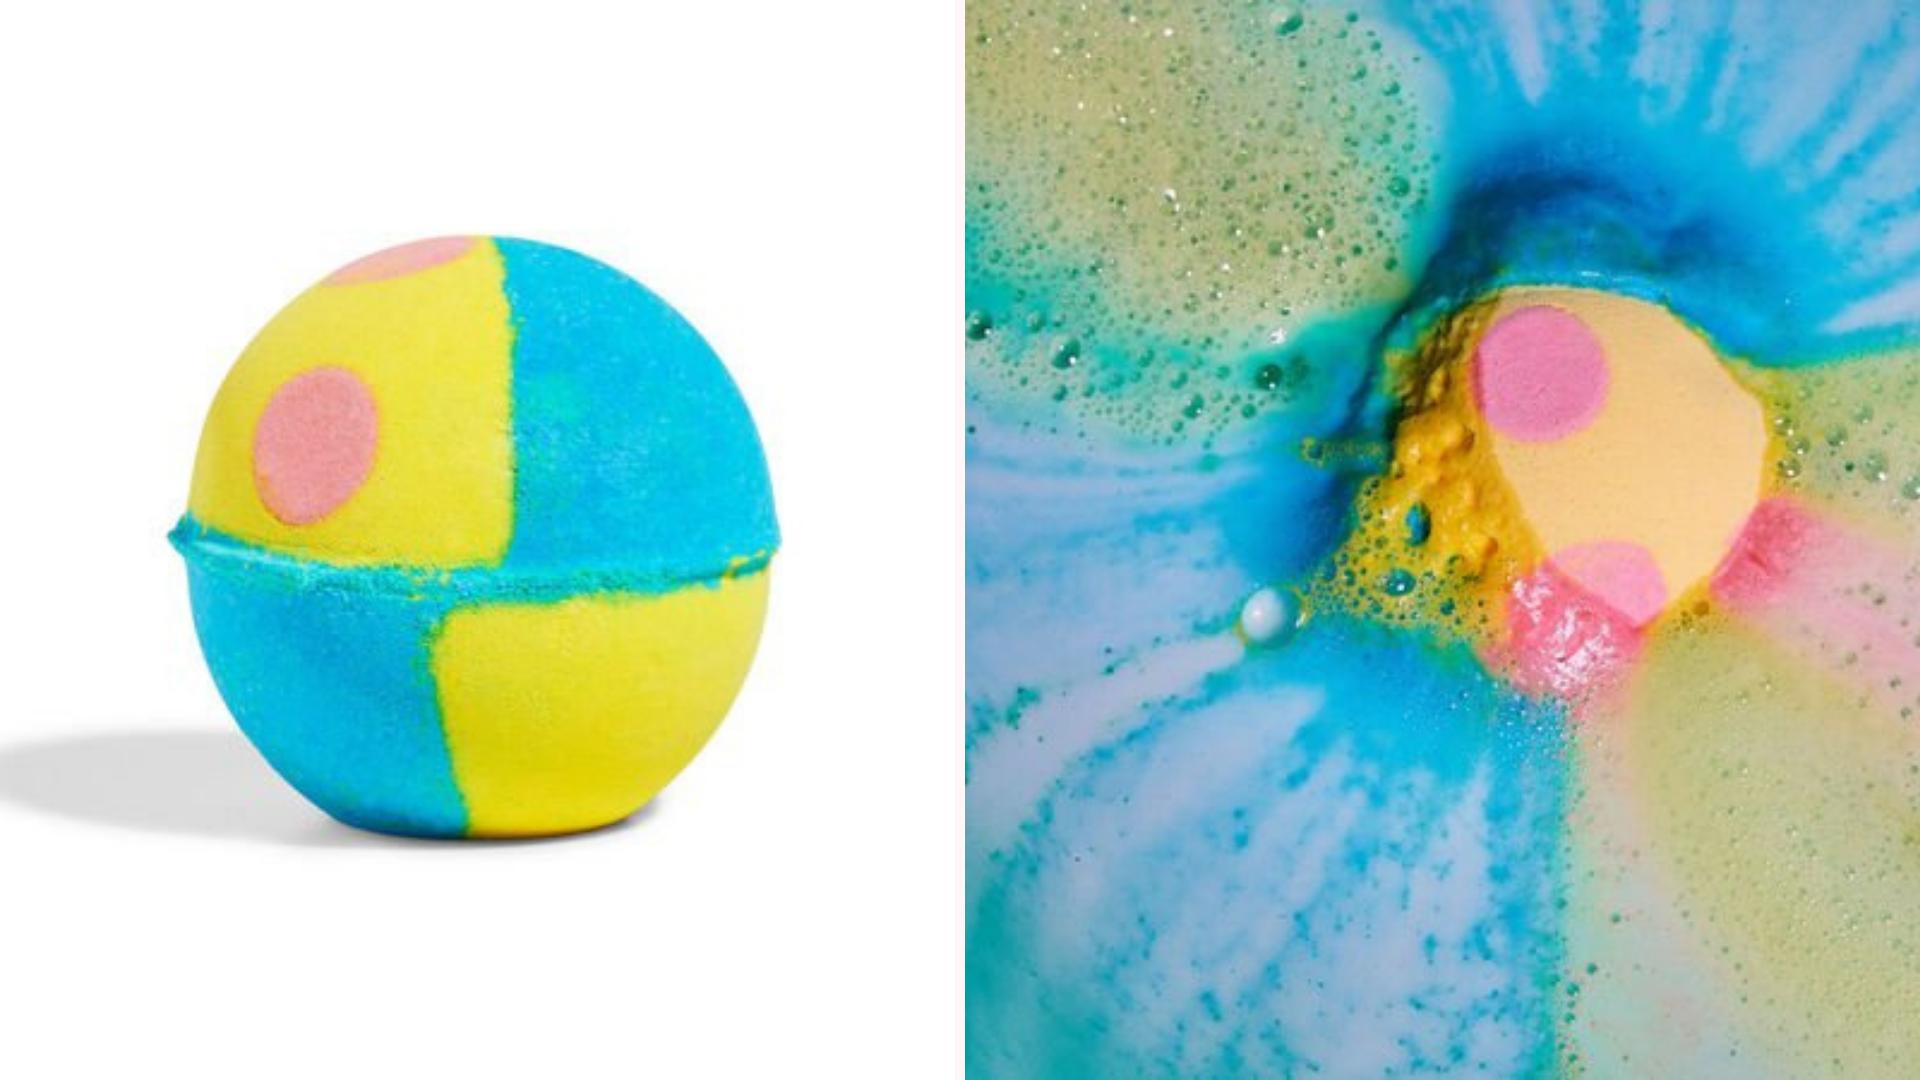 A bath bomb emits yellow and blue colors